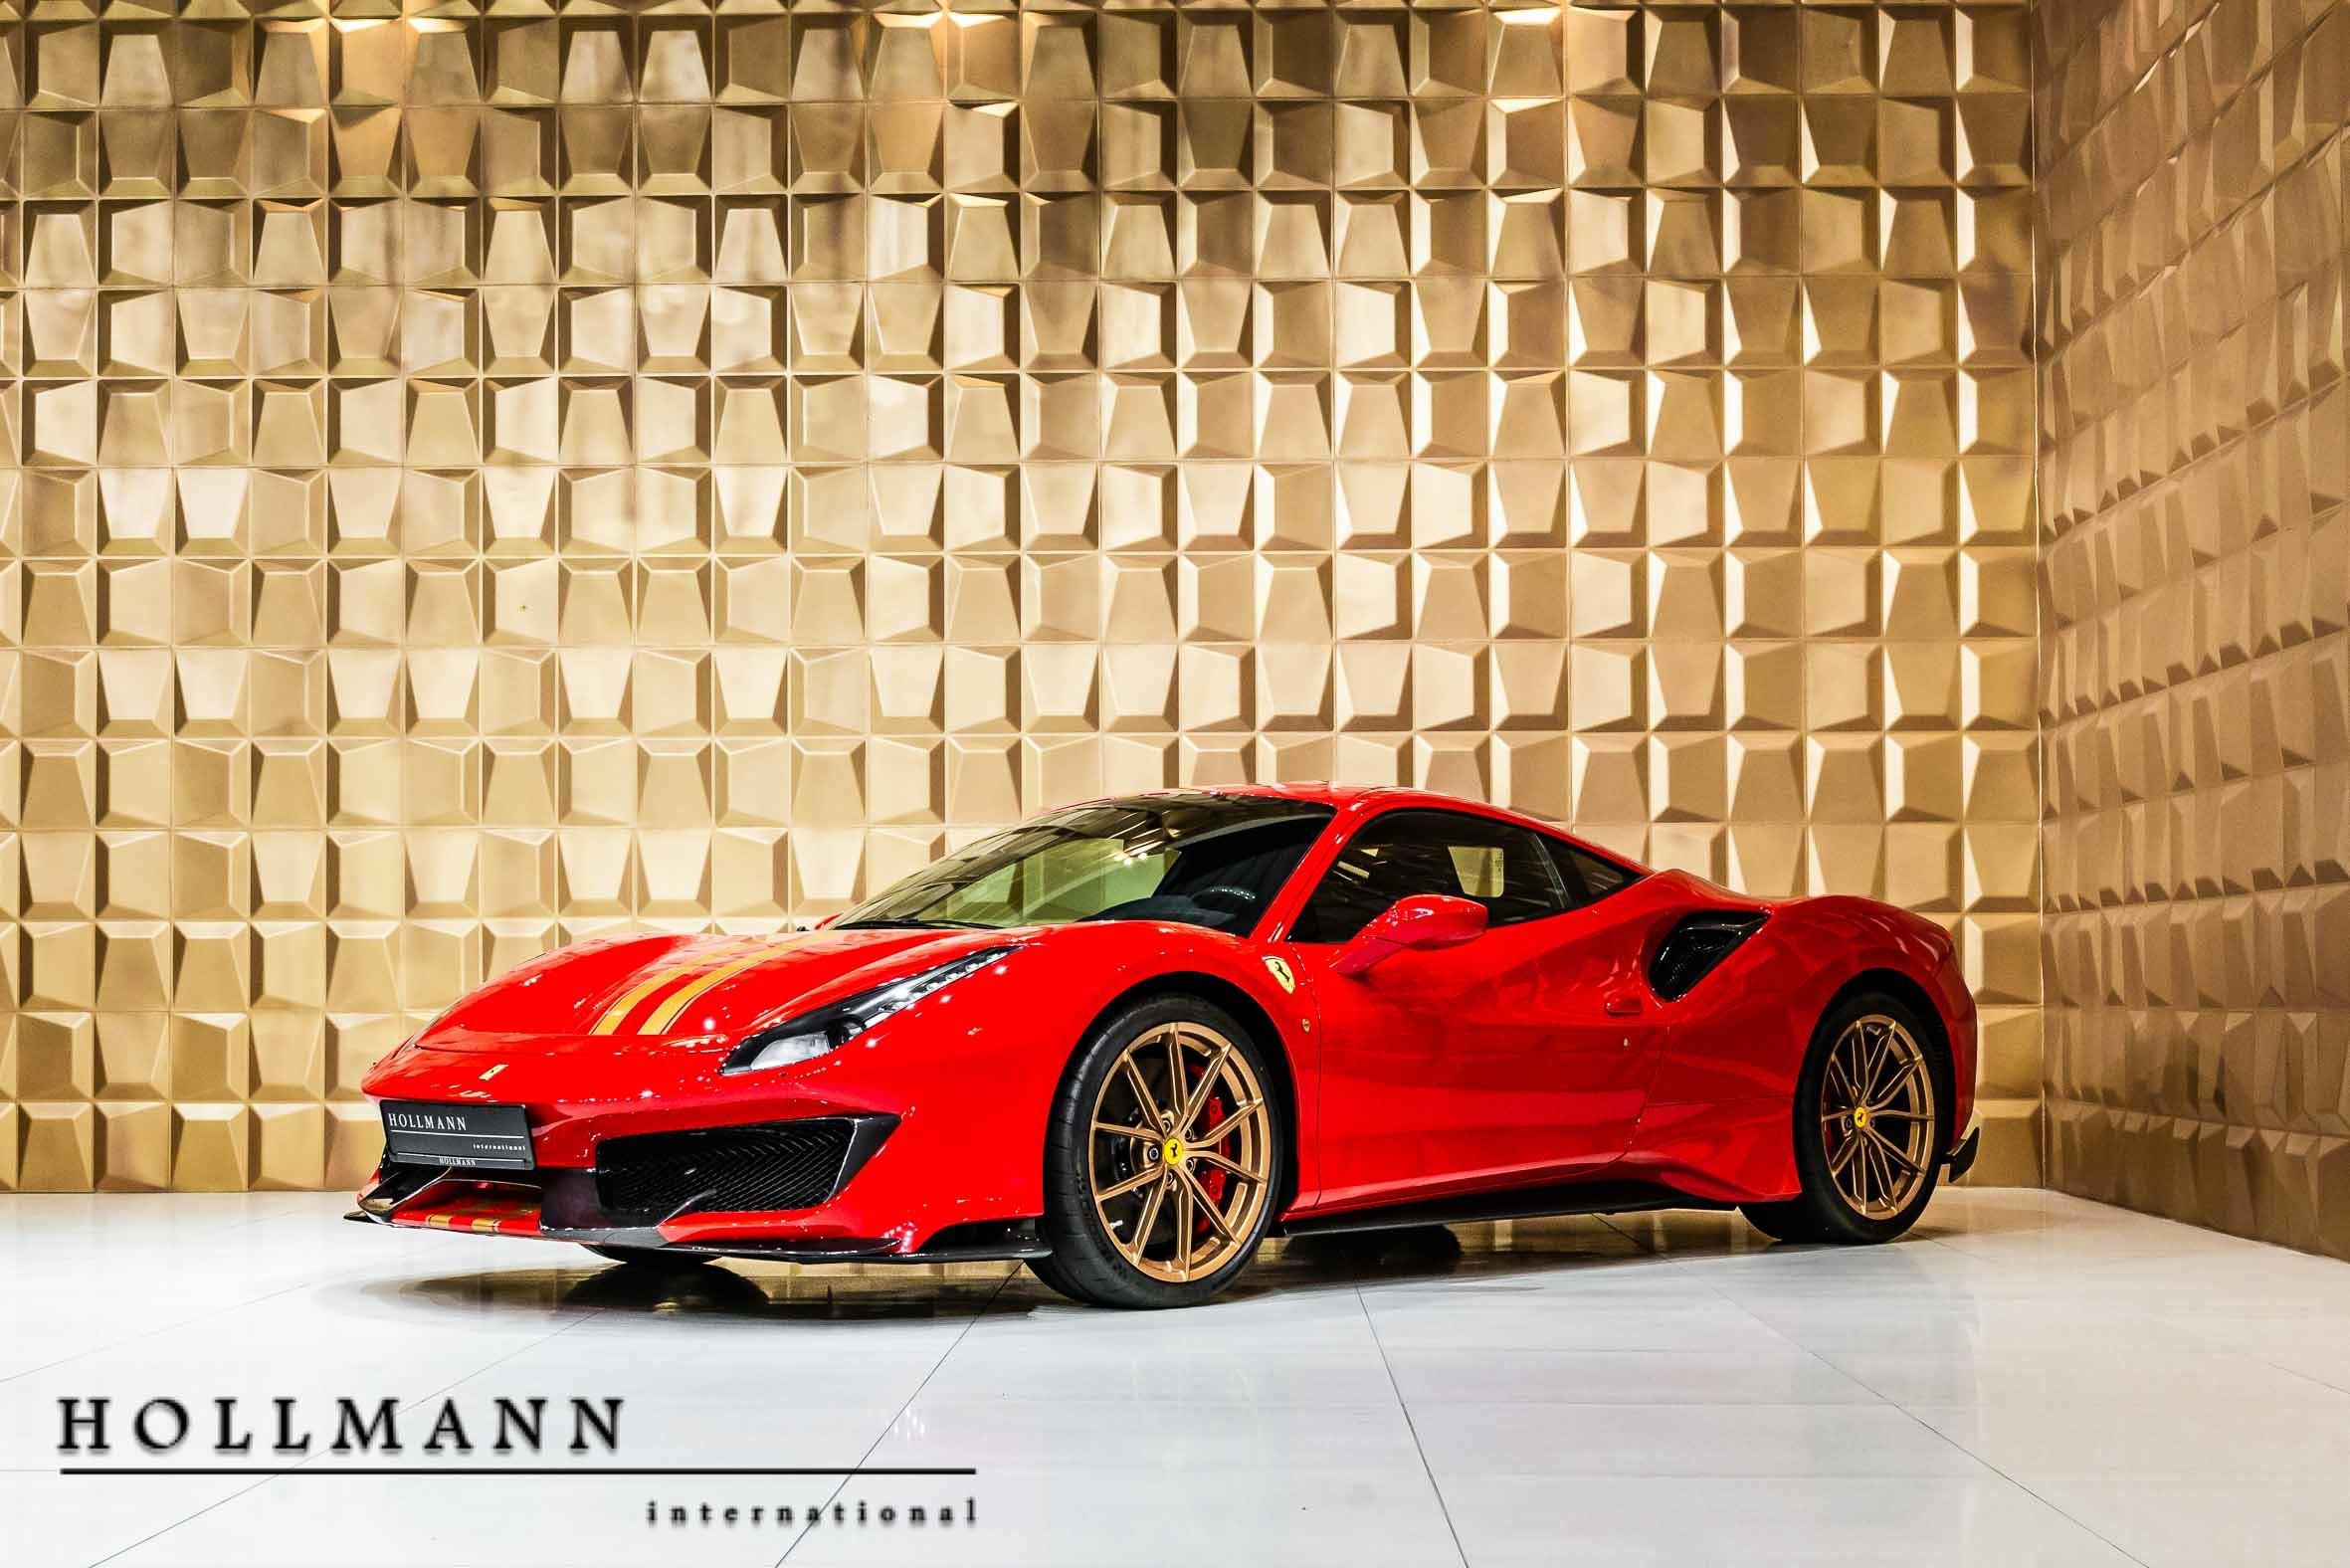 Ferrari 488 Pista Luxury Pulse Cars Germany For Sale On Luxurypulse